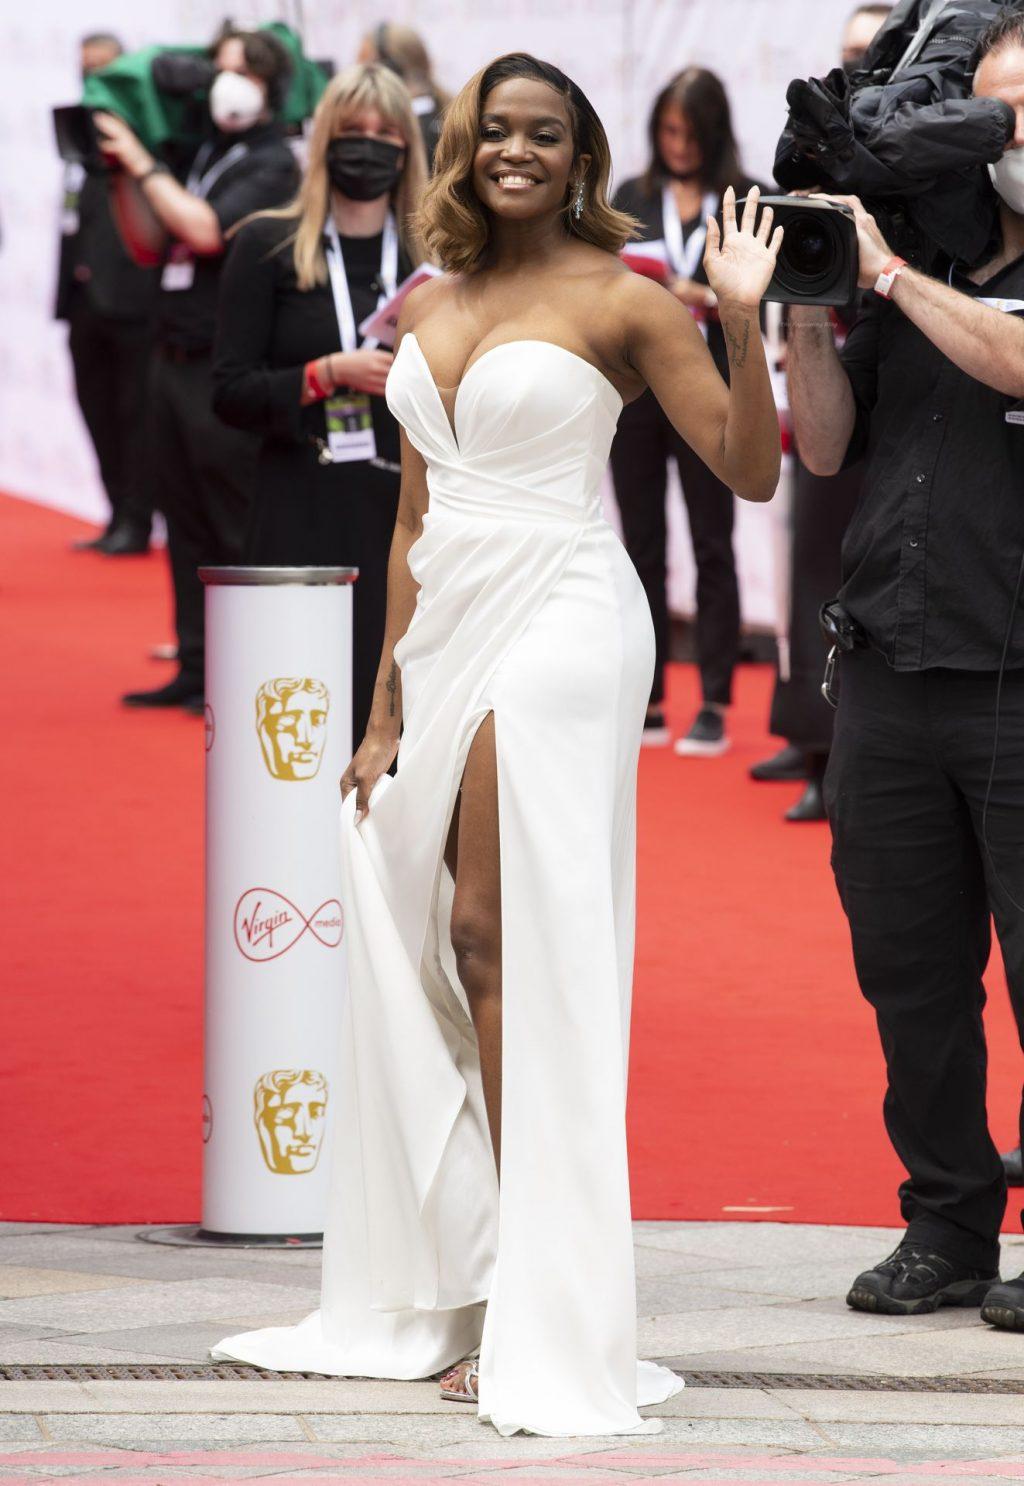 Busty Oti Mabuse Stuns in a White Dress at 2021 Virgin Media British Academy Awards (8 Photos)